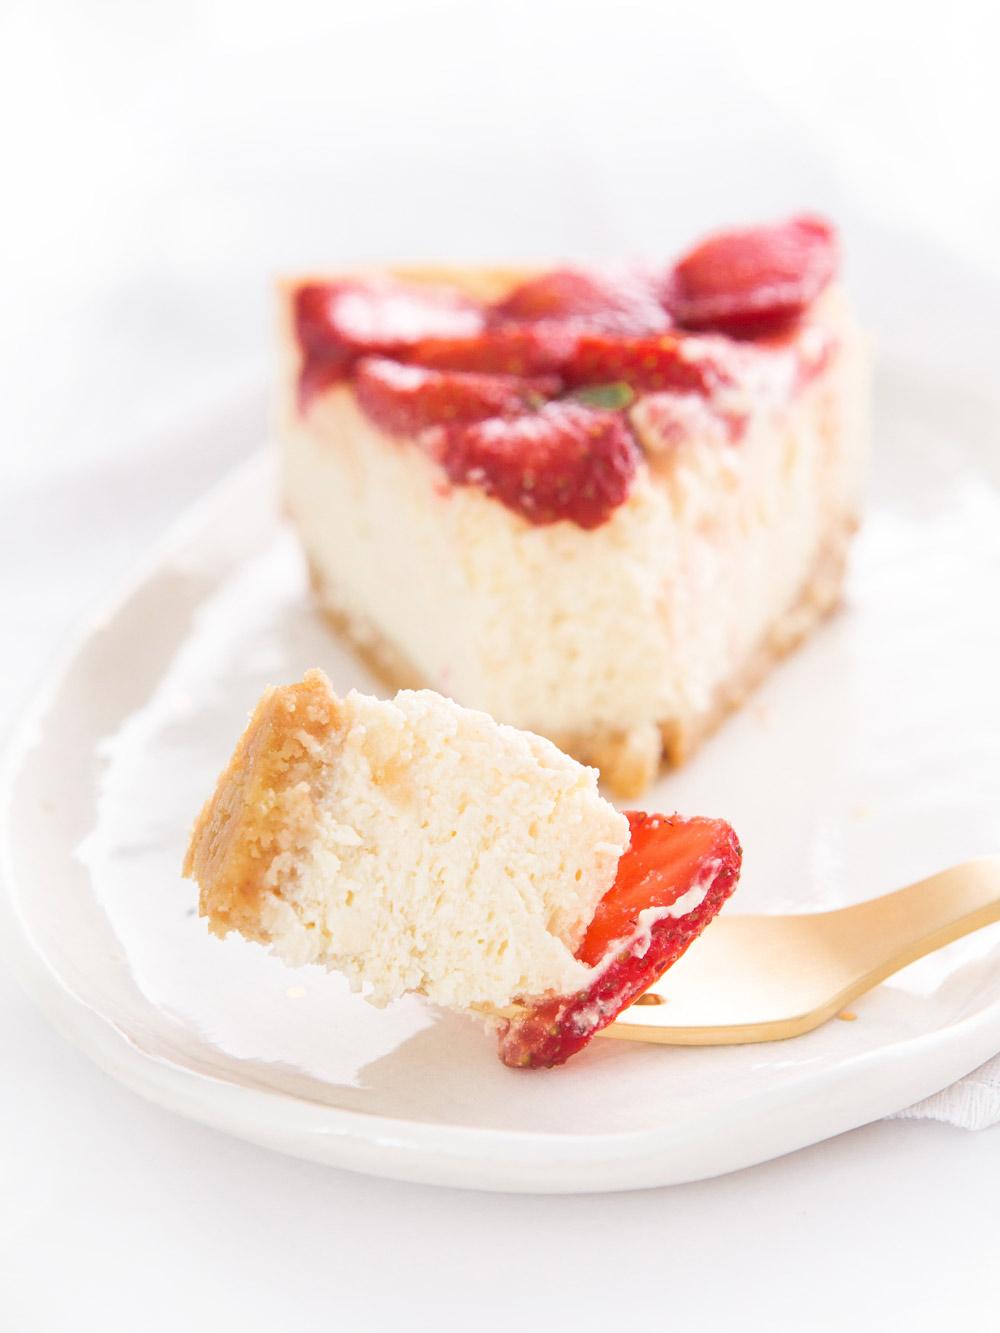 Blanccoco_Recette_Cheesecake_Fraise_Basilic-9